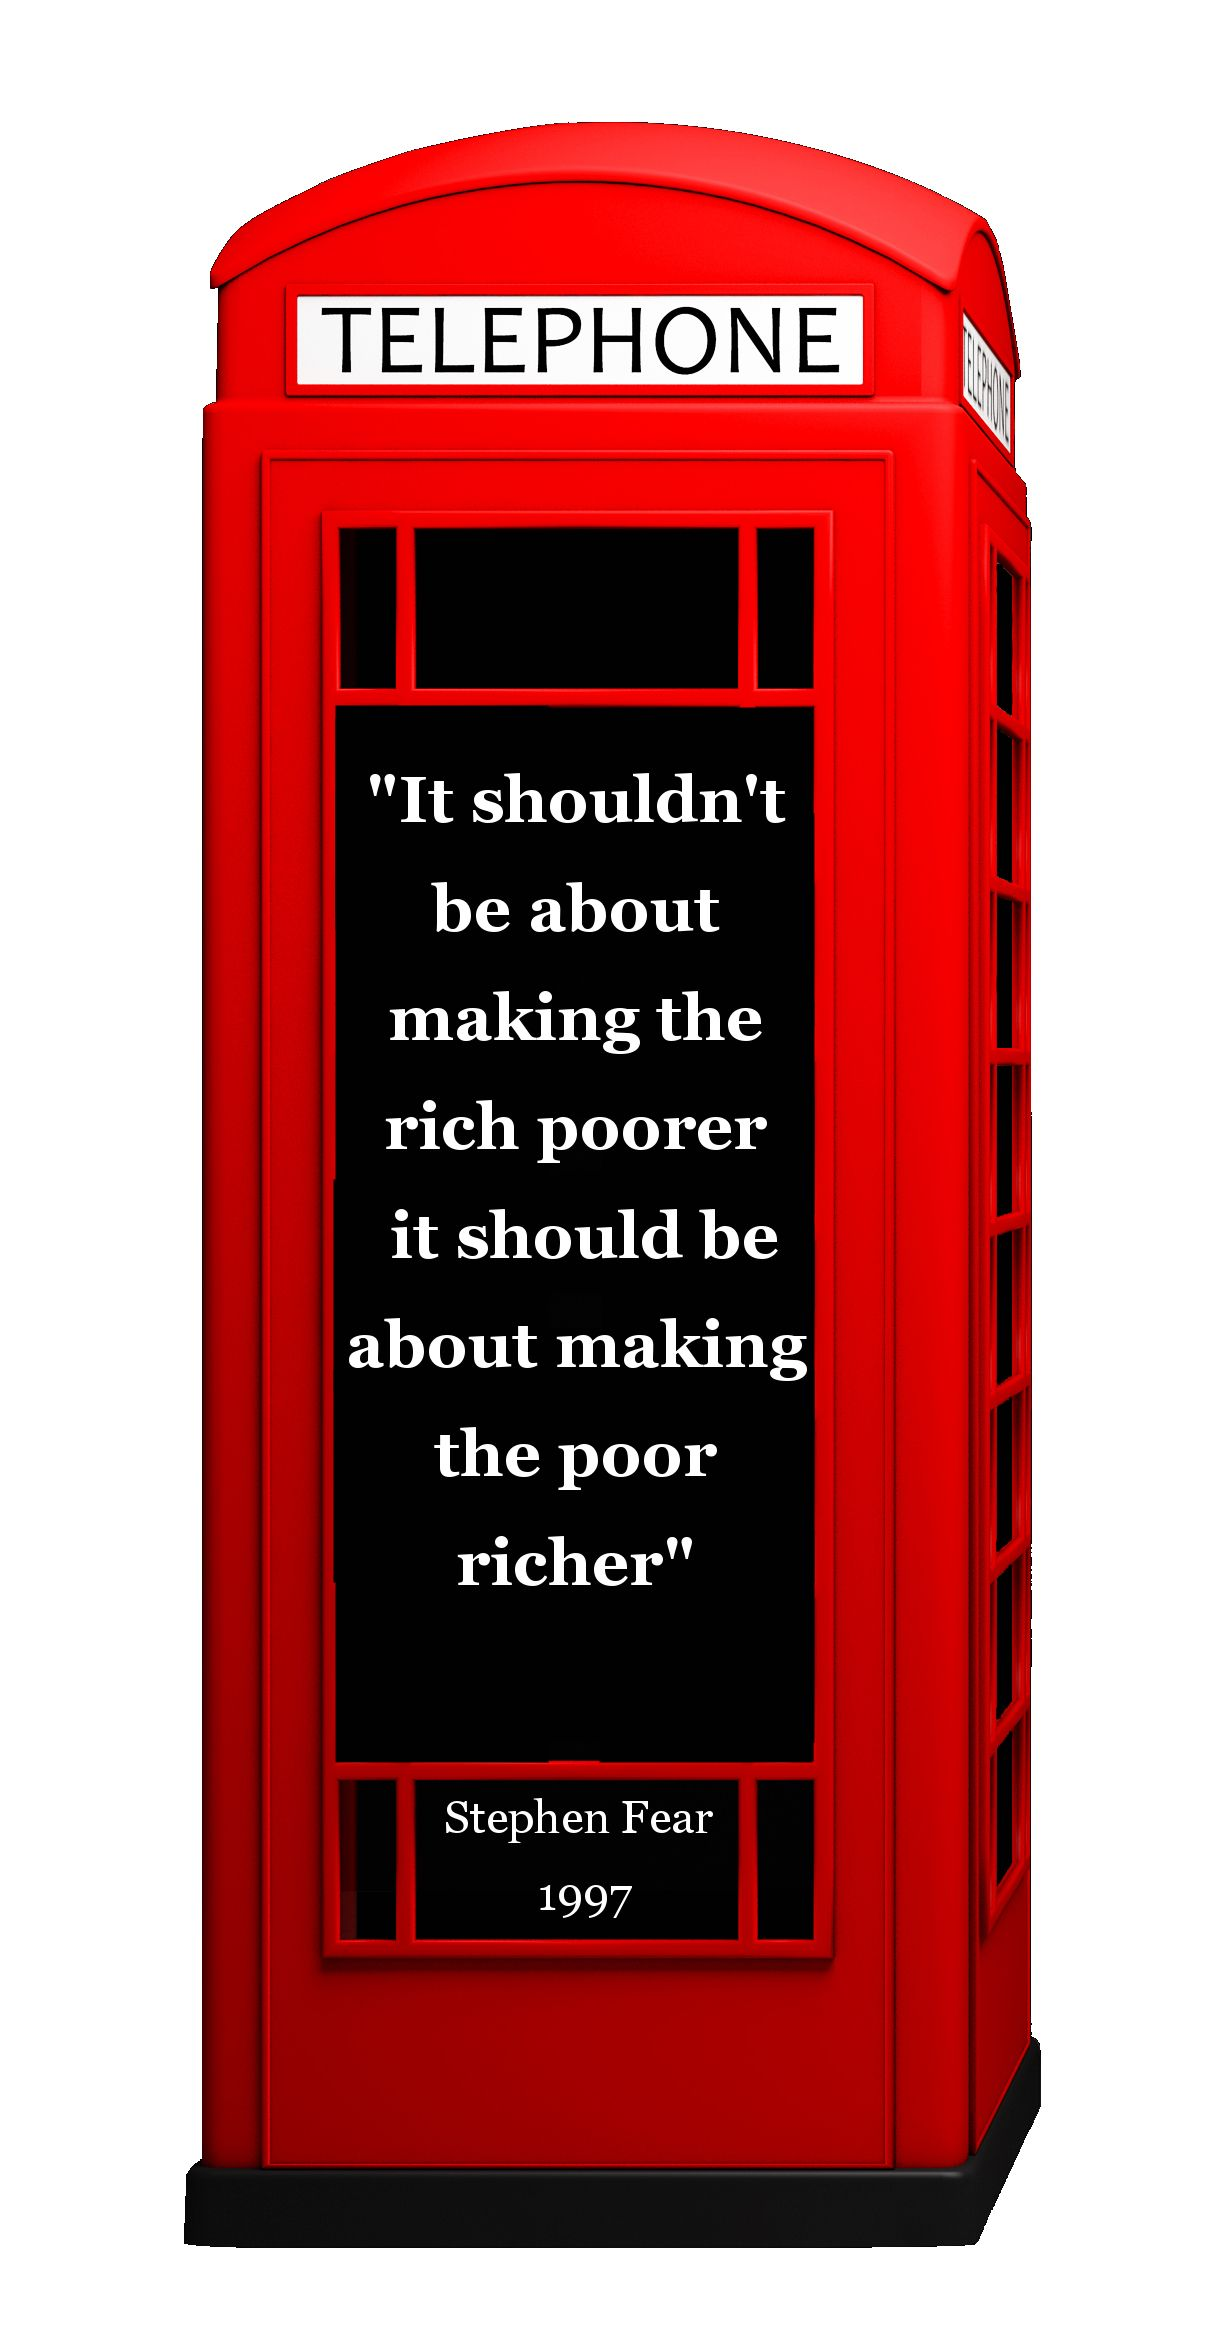 Business Coaching; Business Quotes, Telephone Box, Phonebox Millionaire, Quotes, Advise, Entrepreneur, Success, Motivation, Improving Lives, Economy,